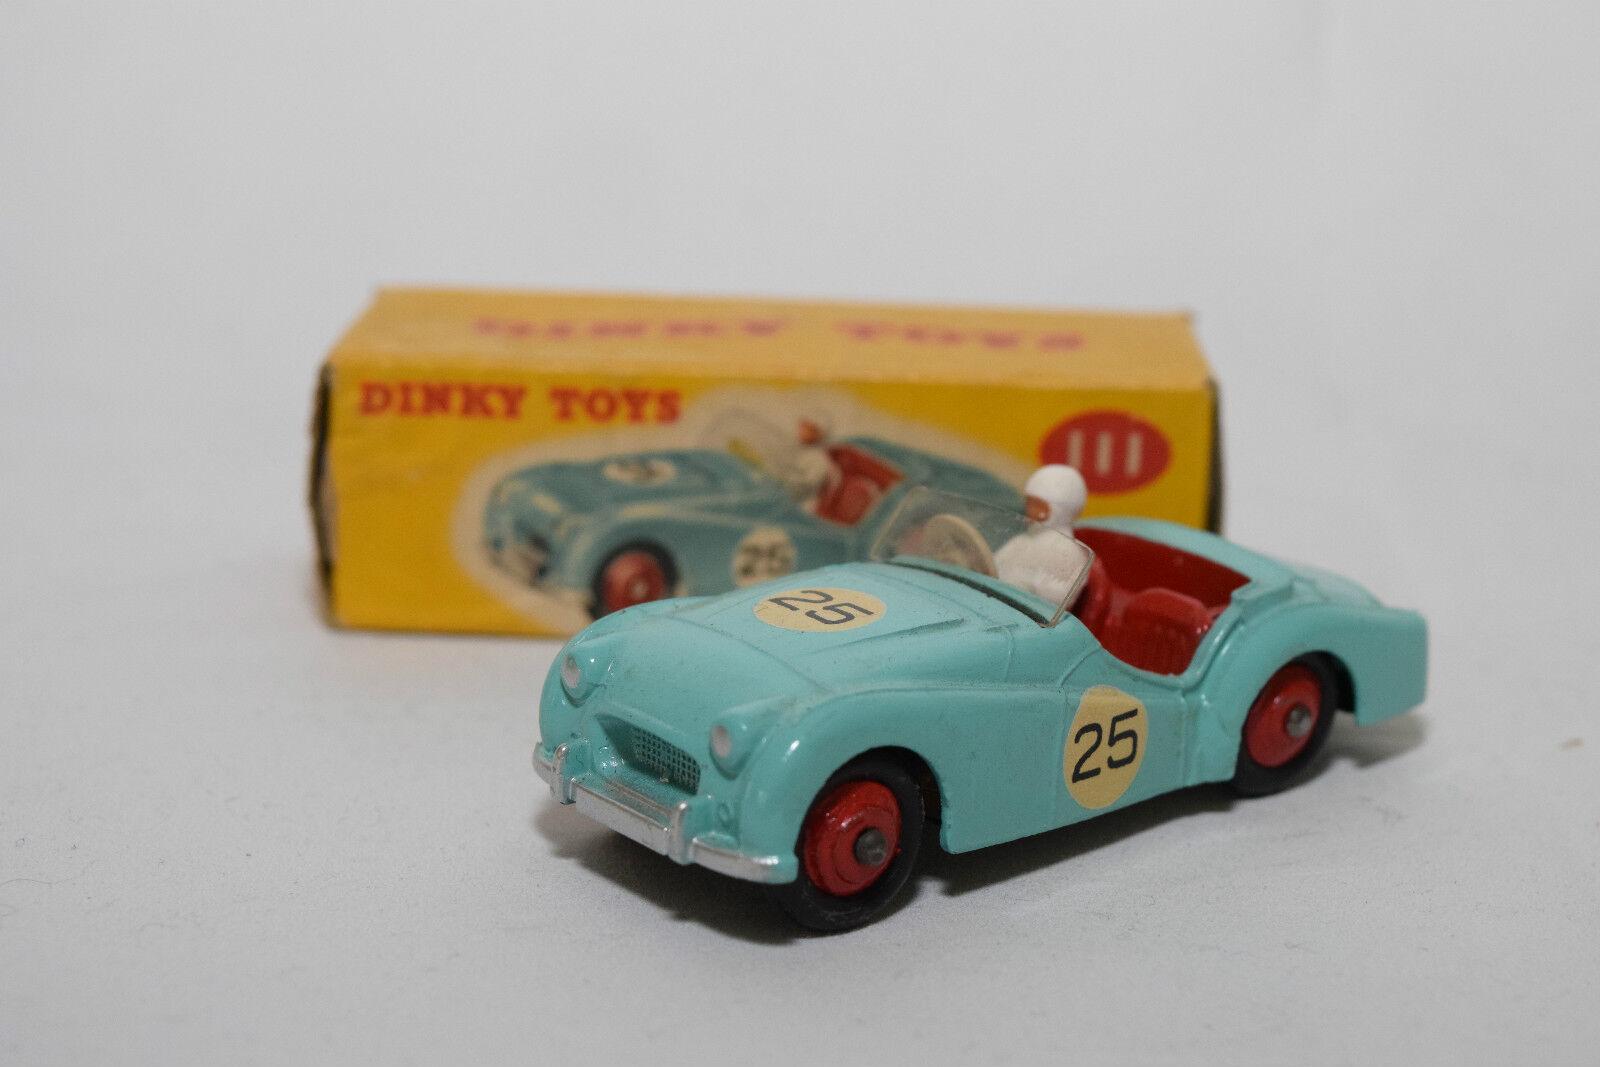 P DINKY TOYS 111 TRIUMPH tr2 TR 2 Sports Car Turquoise MINT BOXED RARE RARO